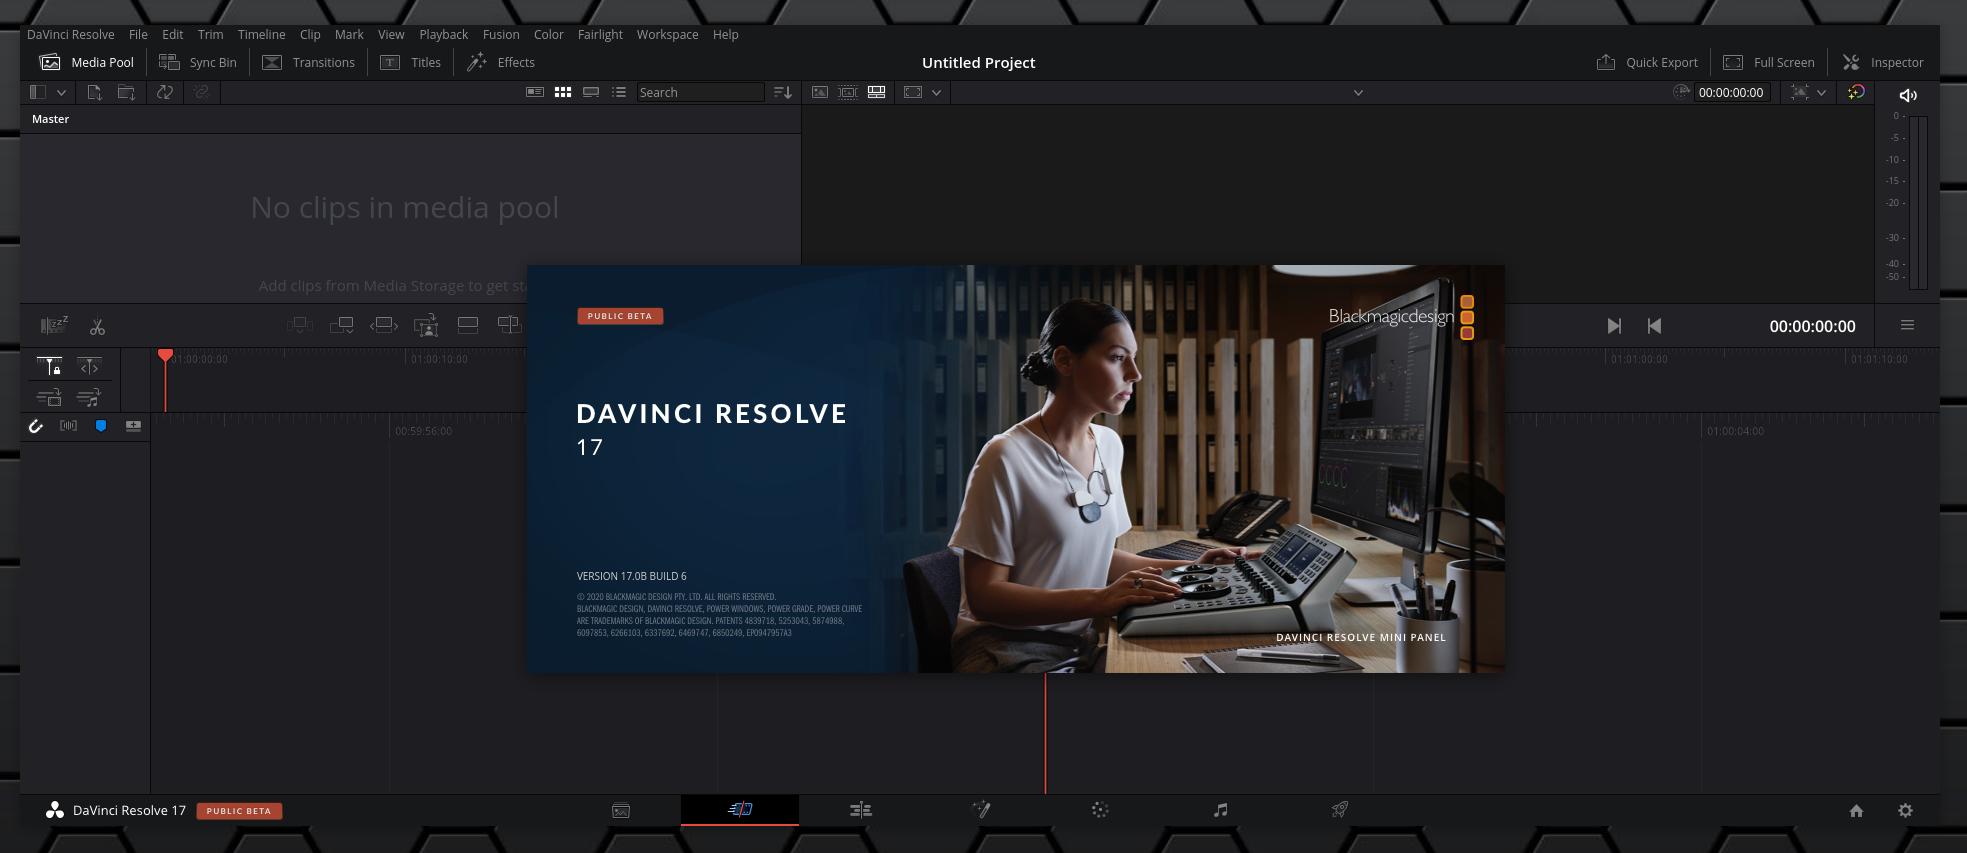 How To Install Davinci Resolve 16 2 Or 17 Beta In Ubuntu Linux Mint Or Debian Generate Deb Package Linux Uprising Blog